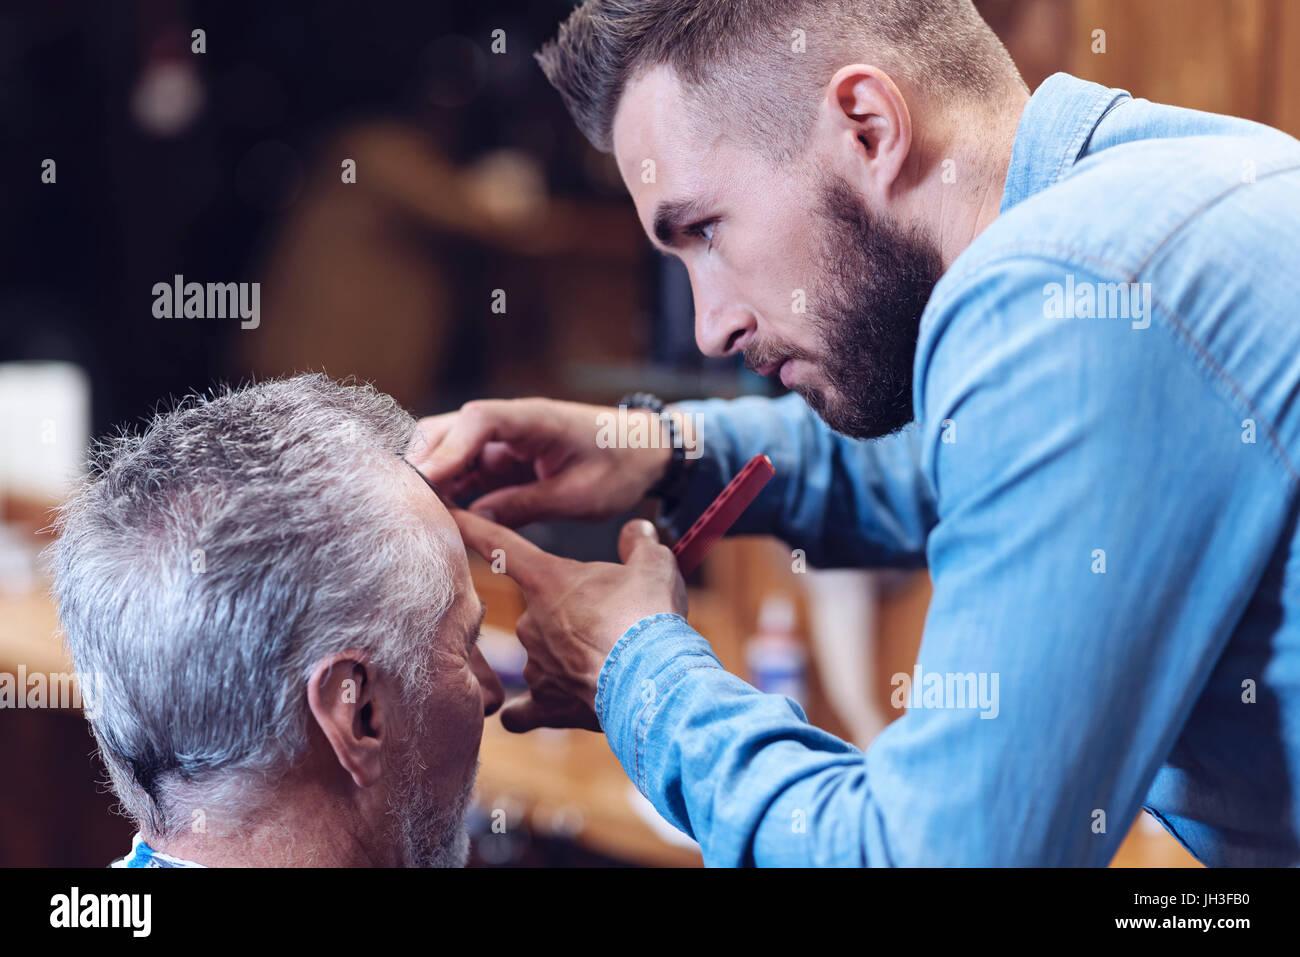 Nice handsome barber doing a haircut - Stock Image